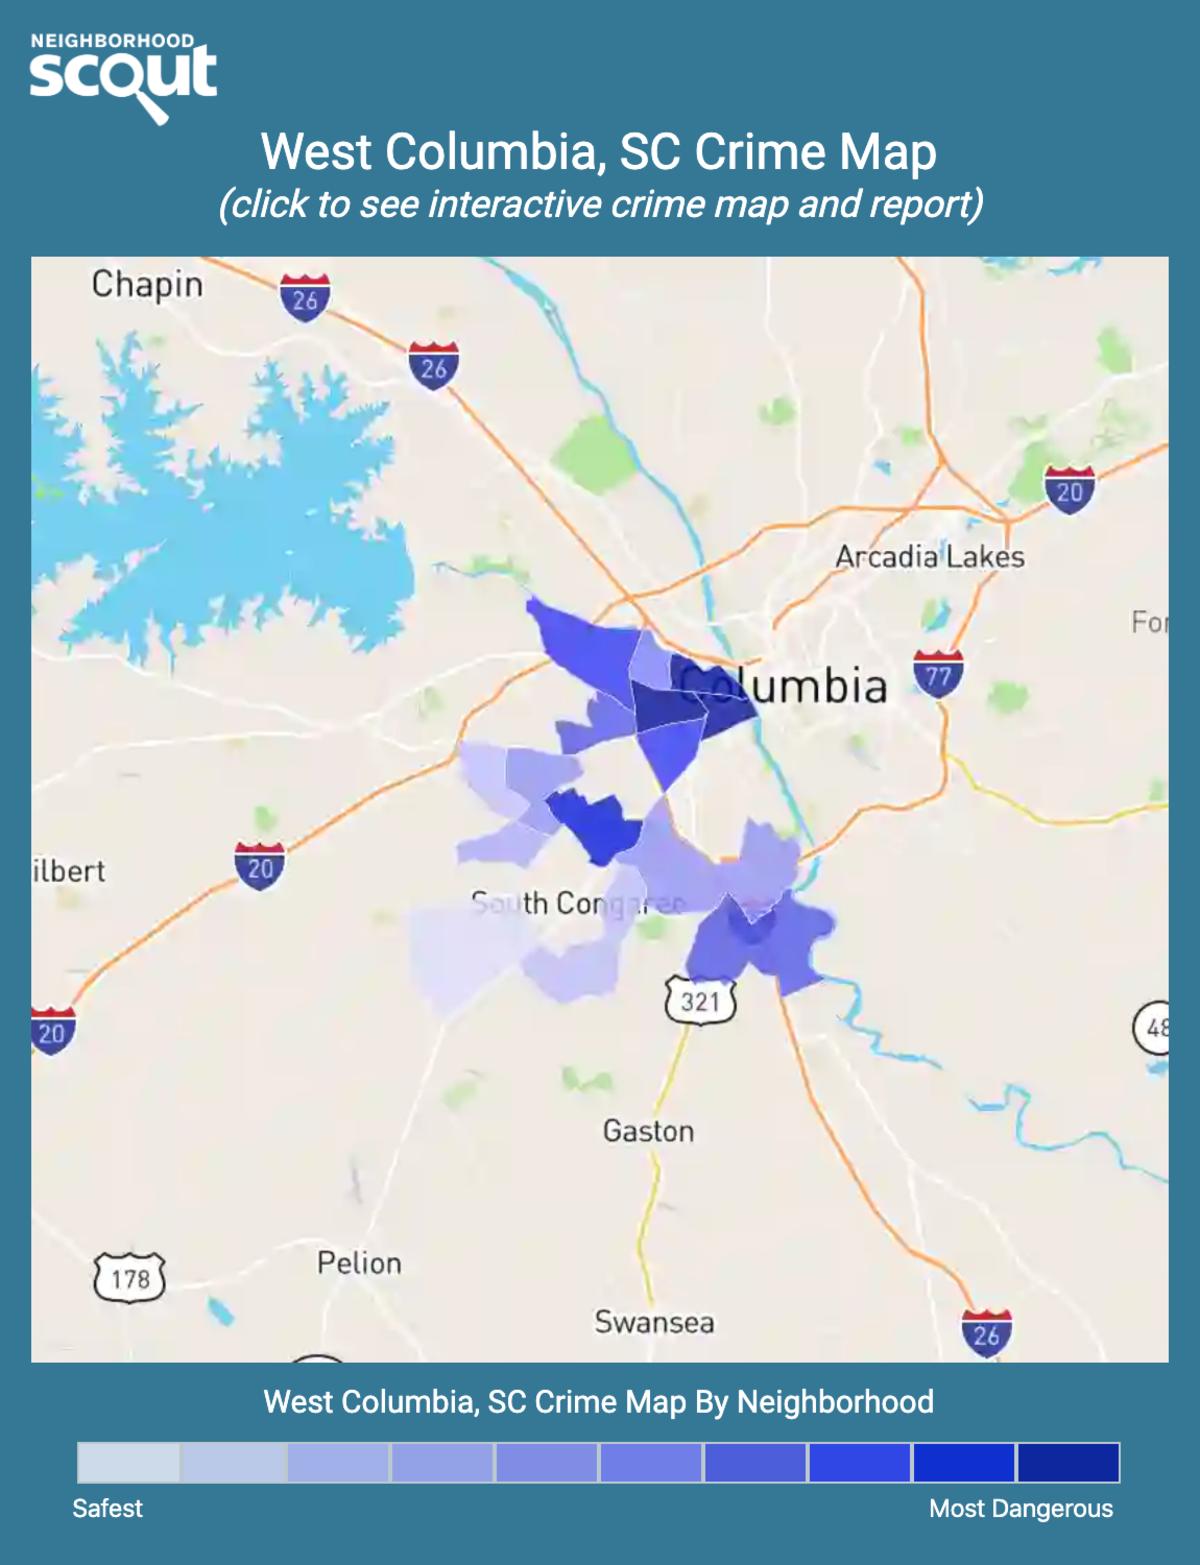 West Columbia, South Carolina crime map